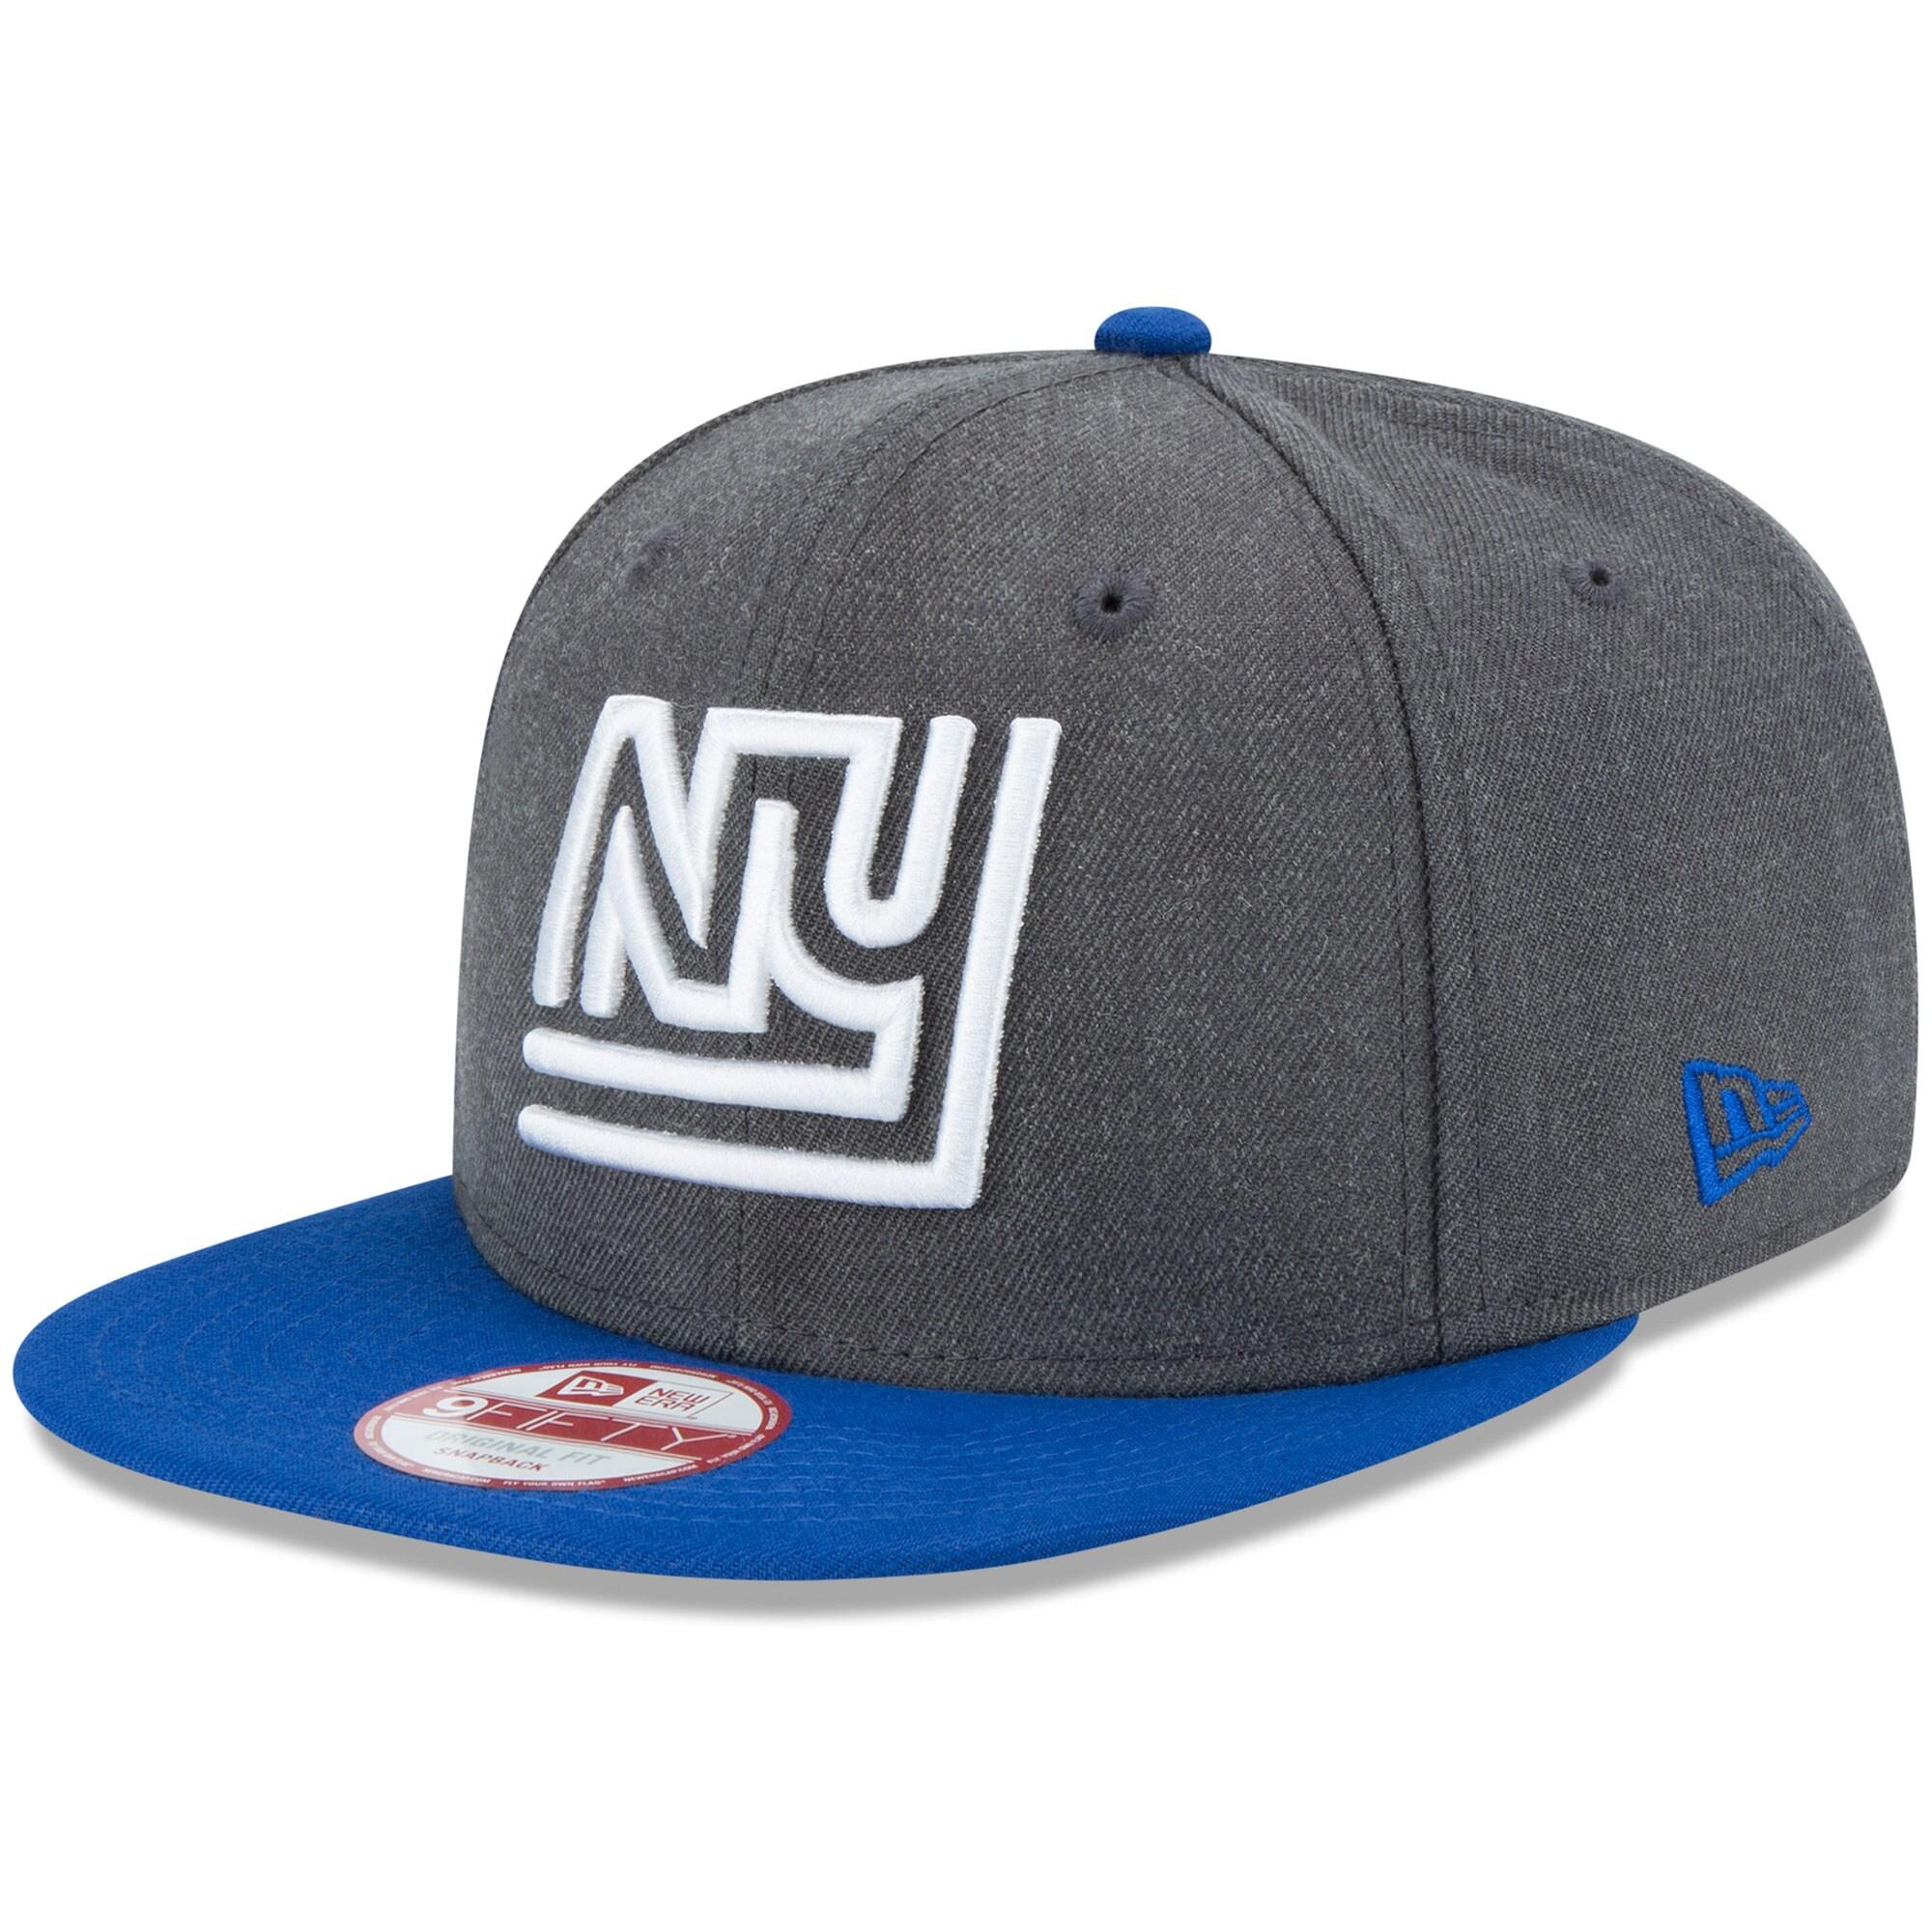 New York Giants New Era Historic 9FIFTY Adjustable Snapback Hat - Heathered Charcoal/Royal